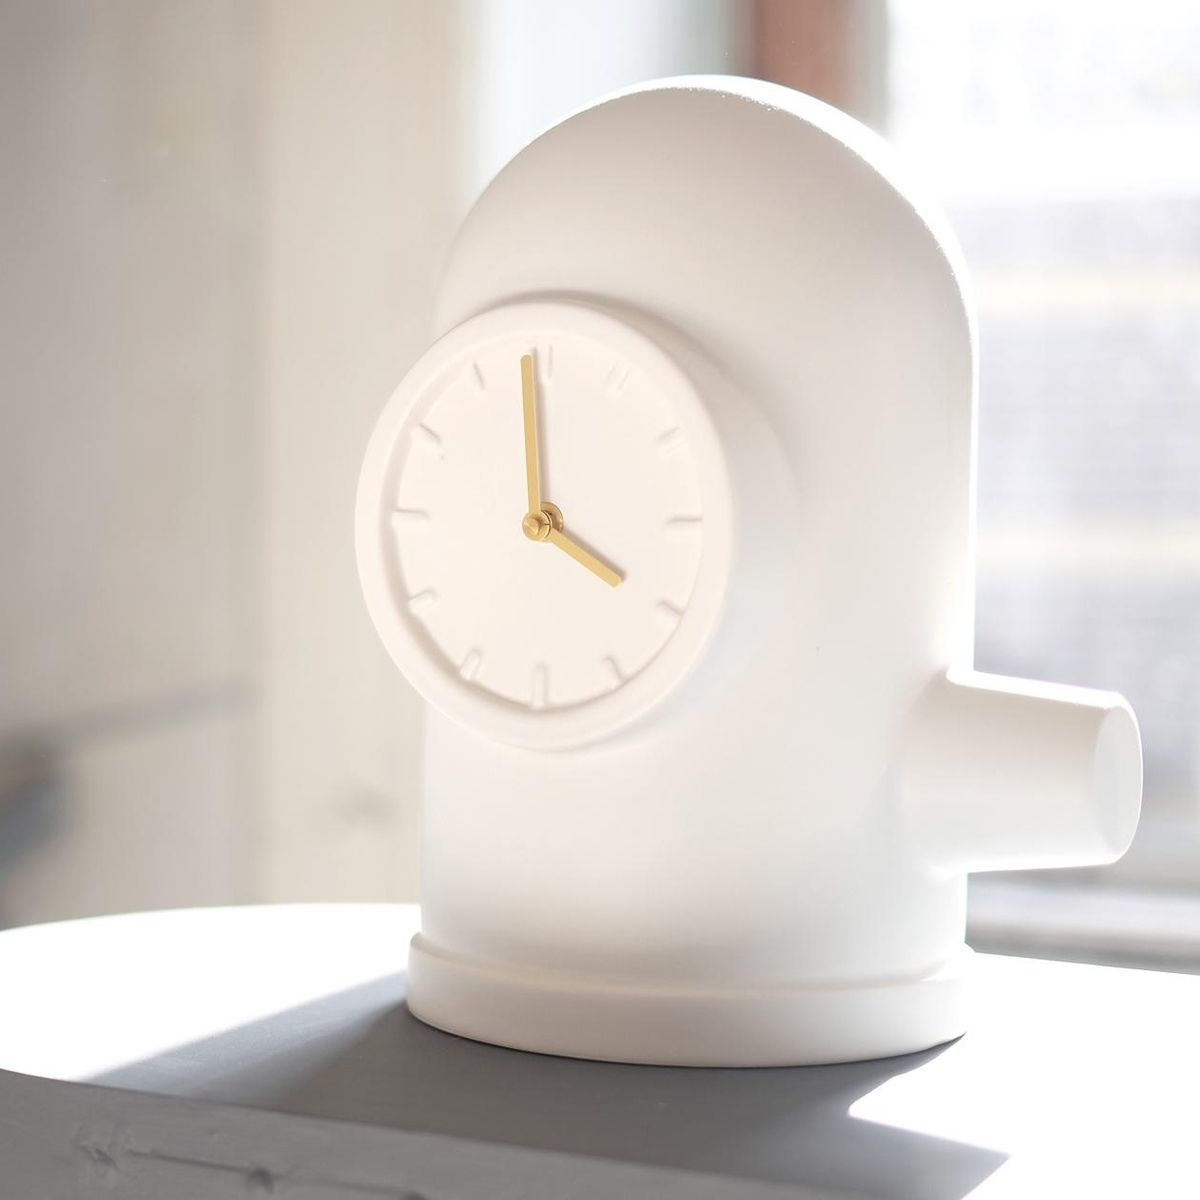 Leff base horloge table leff amsterdam horloges for Horloge eames